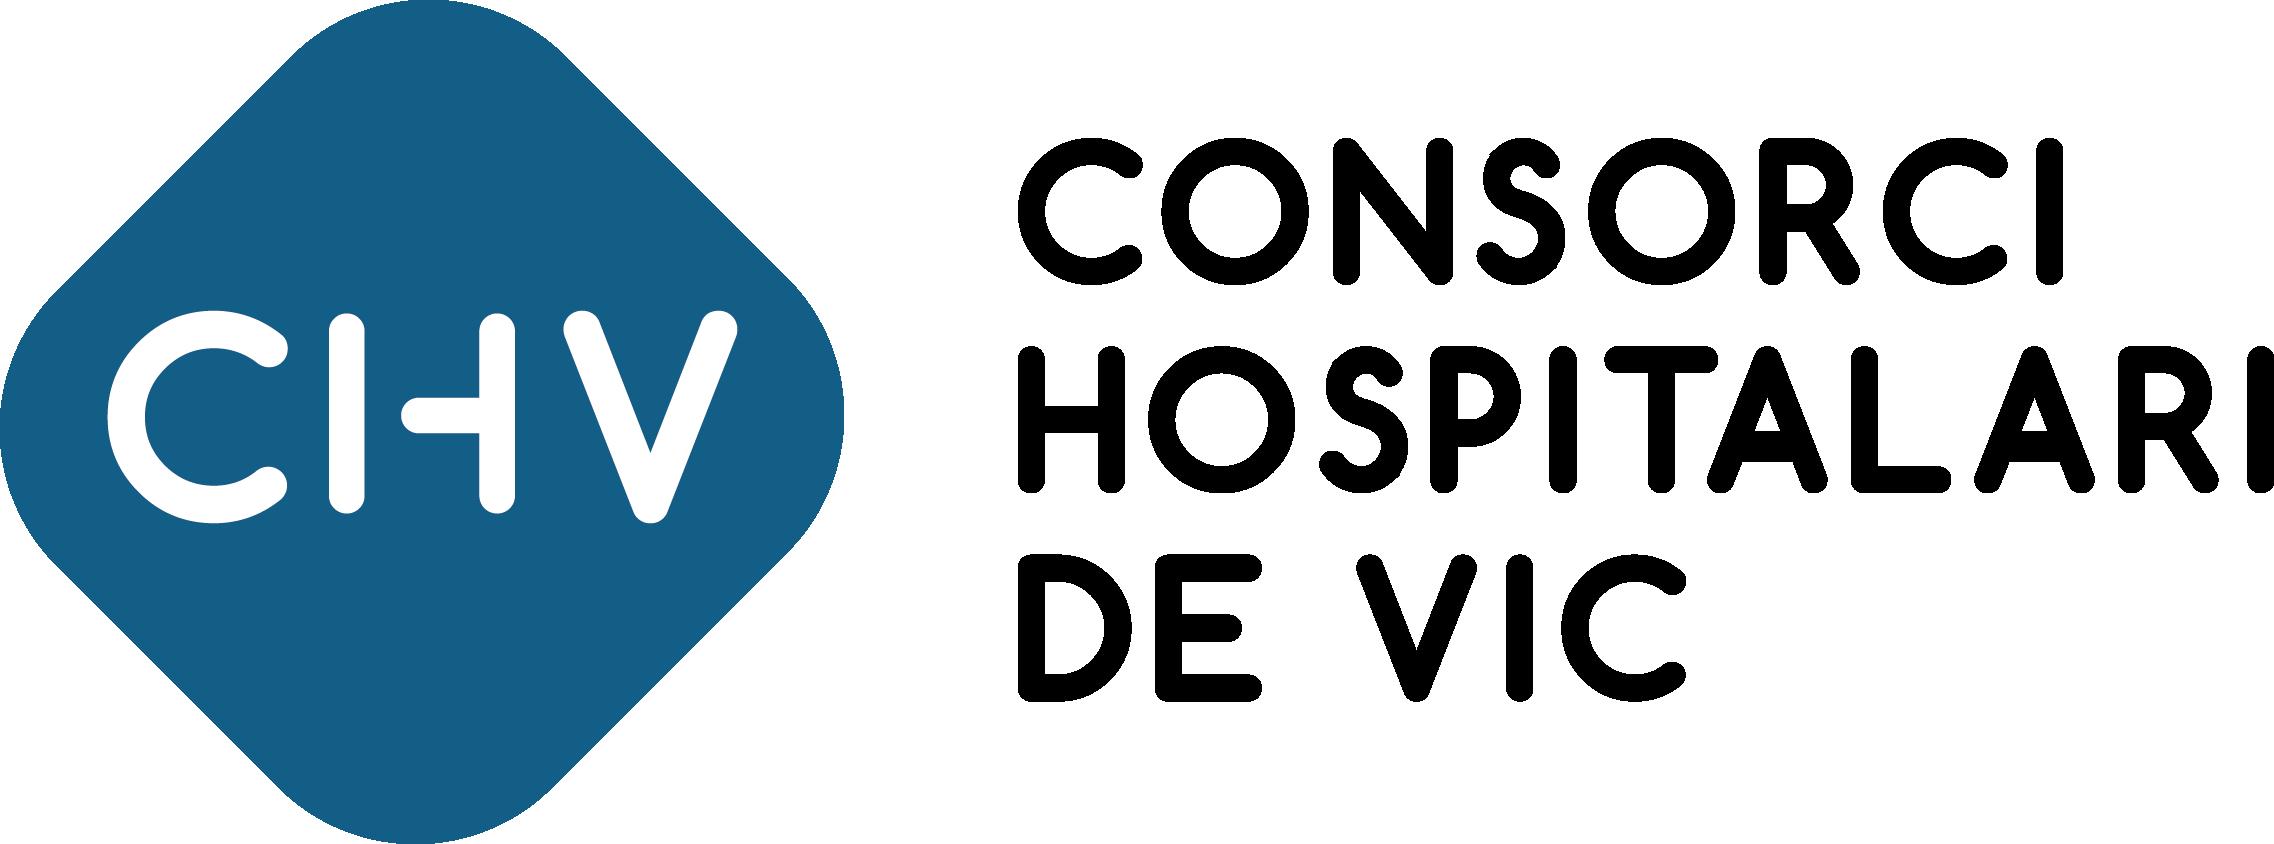 Consorci Hospitalari de Vic (CHV) - Logo